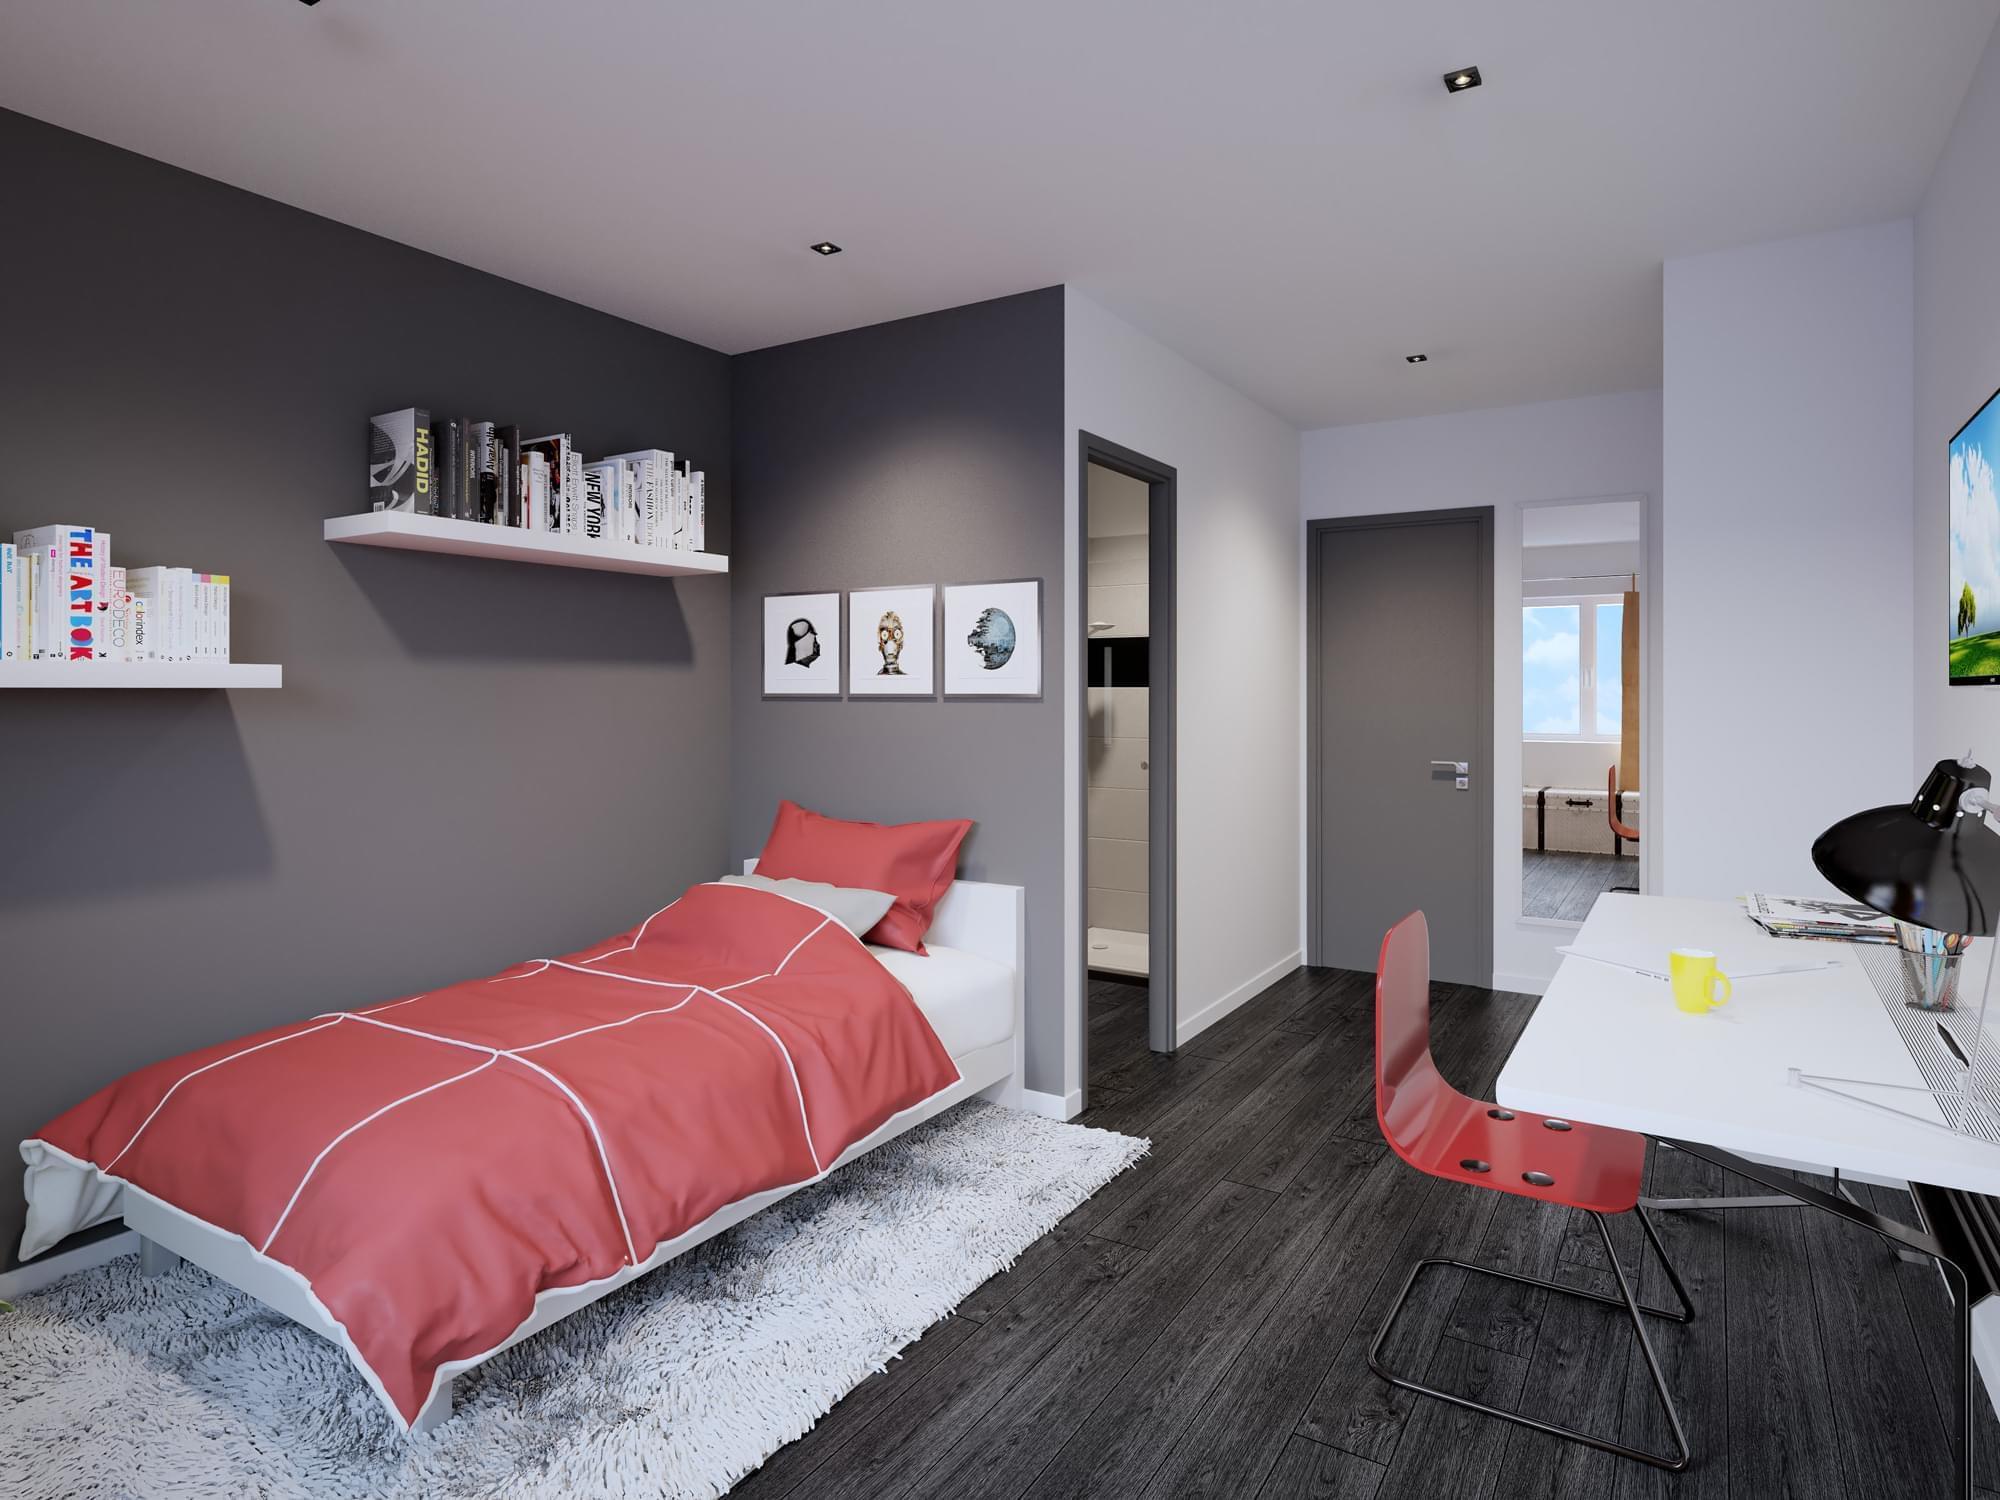 studios neufs en lmnp r habilit villeurbanne edouard vii id al investisseur. Black Bedroom Furniture Sets. Home Design Ideas